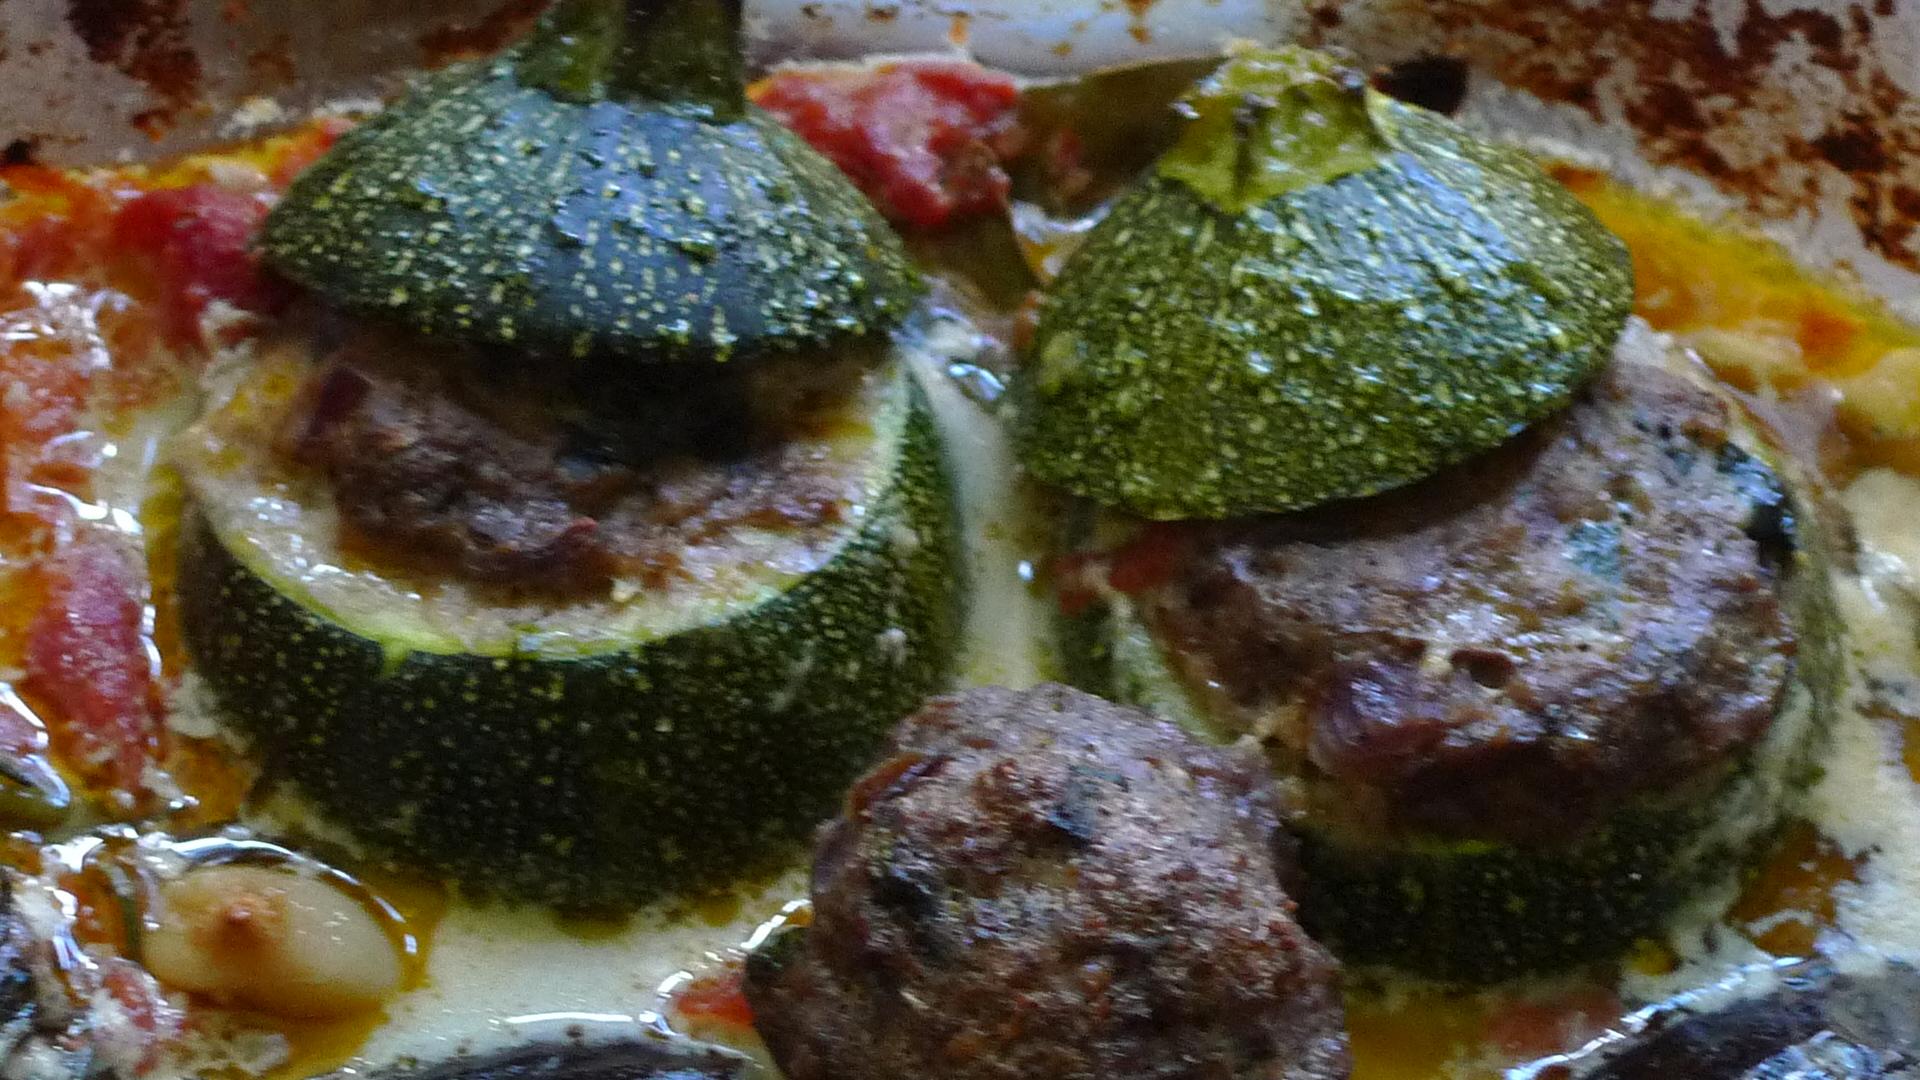 gefüllte Zucchini,Kartoffel,Rhabarberkompott - 30.4.15   (12)